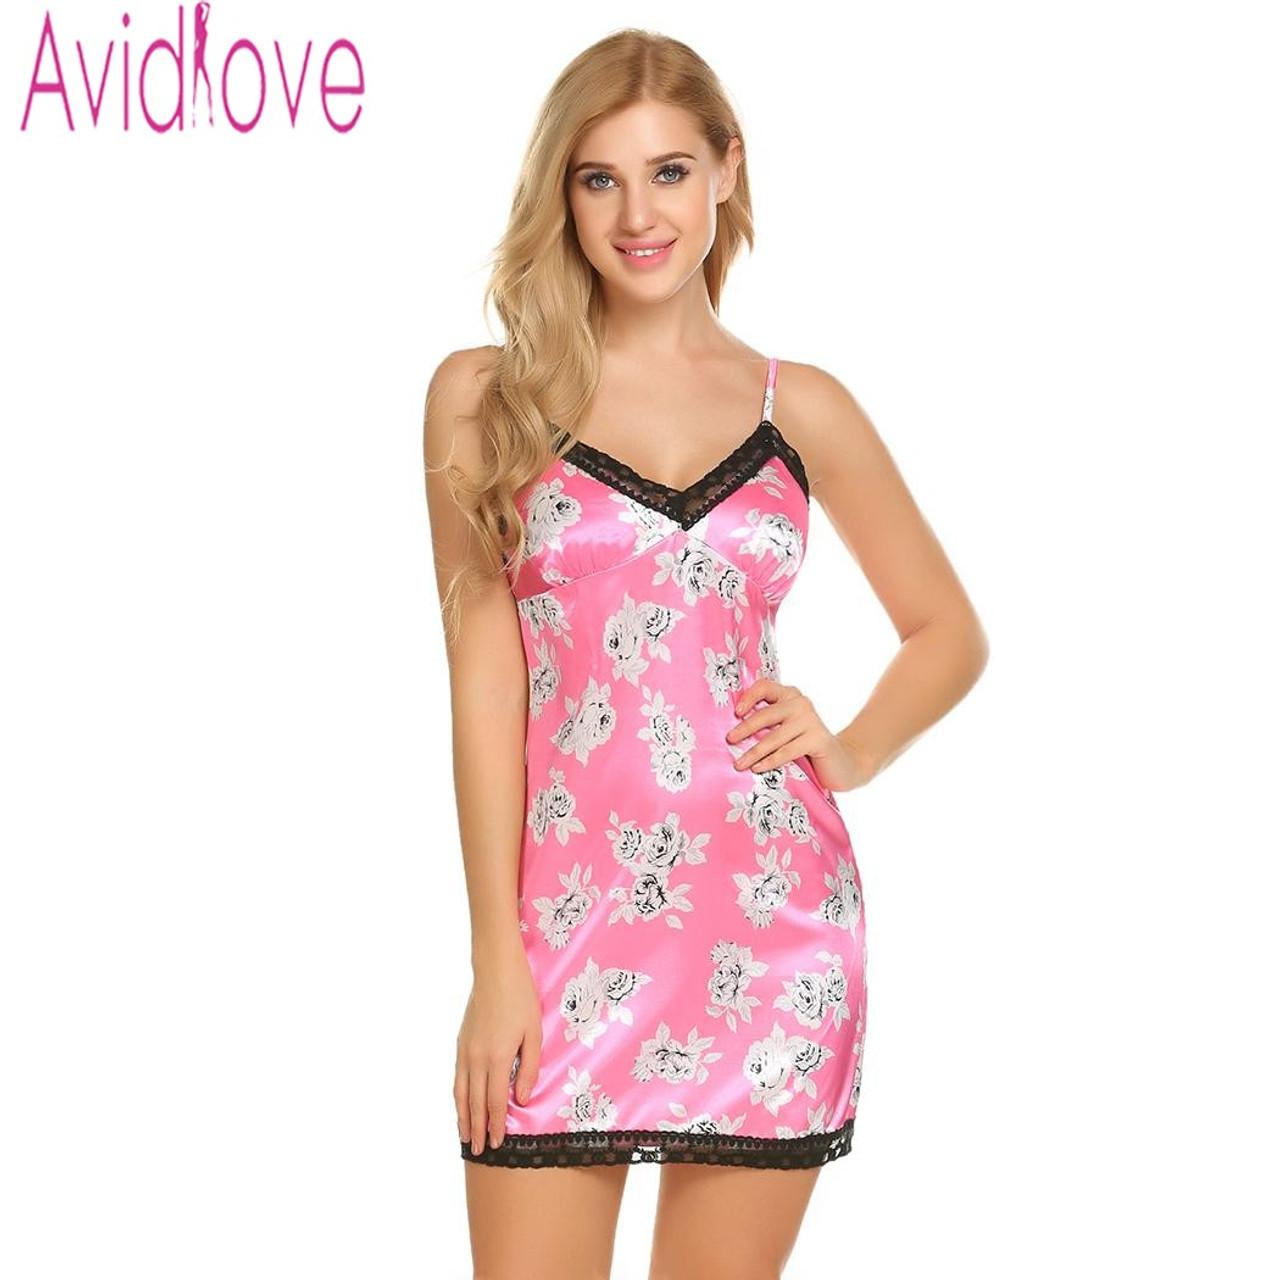 89351ae6fce Avidlove Satin Night Dress Women Nightgown Nightwear Night Shirts Slik  Floral Print Dress Plus Size Sleepshirt ...